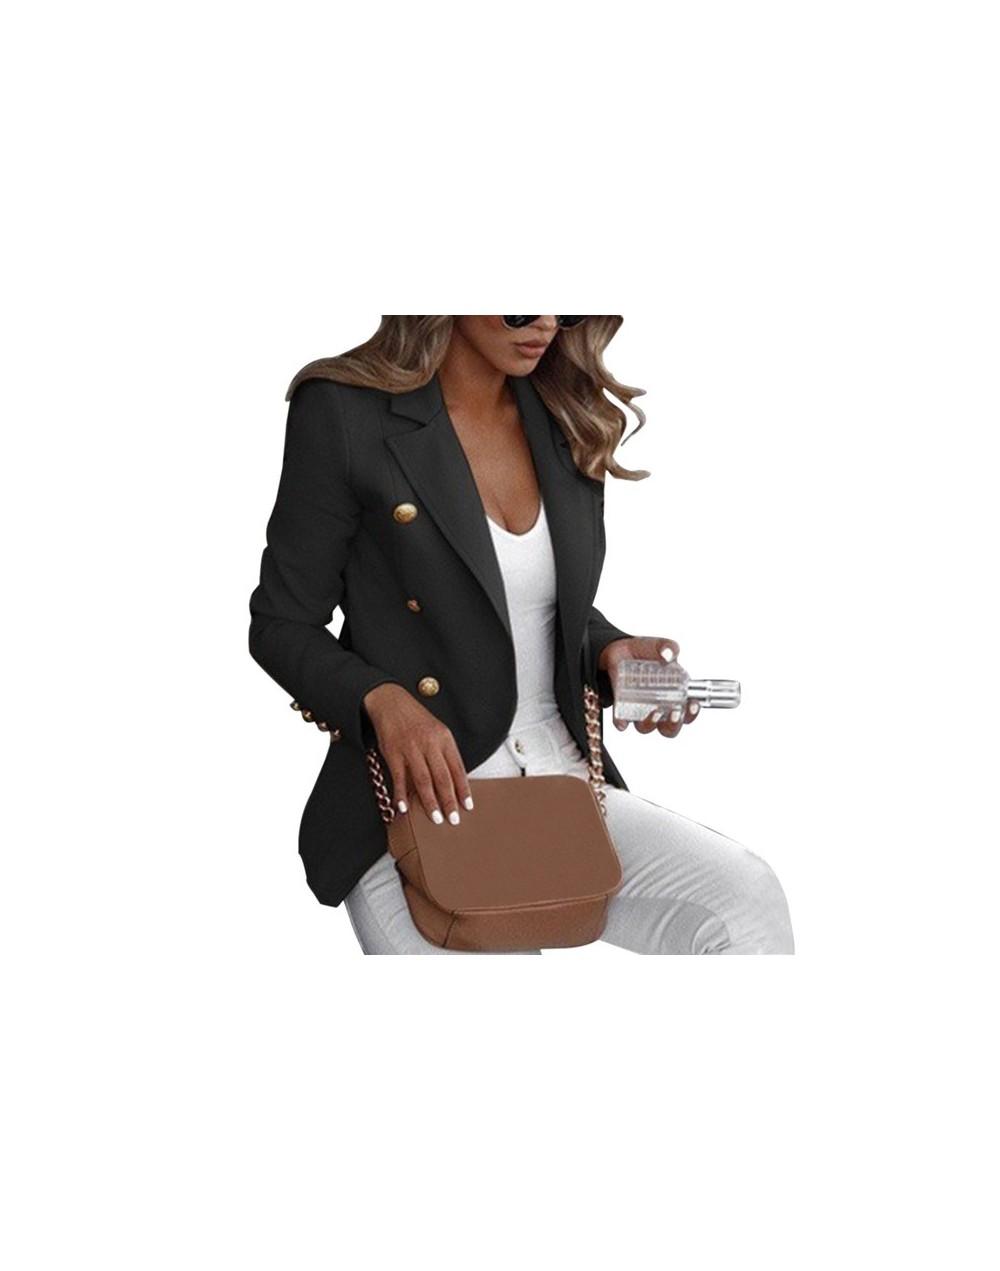 Blazers Women 2019 Fashion Spring Autumn Casual Jacket Female Office Lady Slim Suit Button Business Notched Blazer Coat - bl...